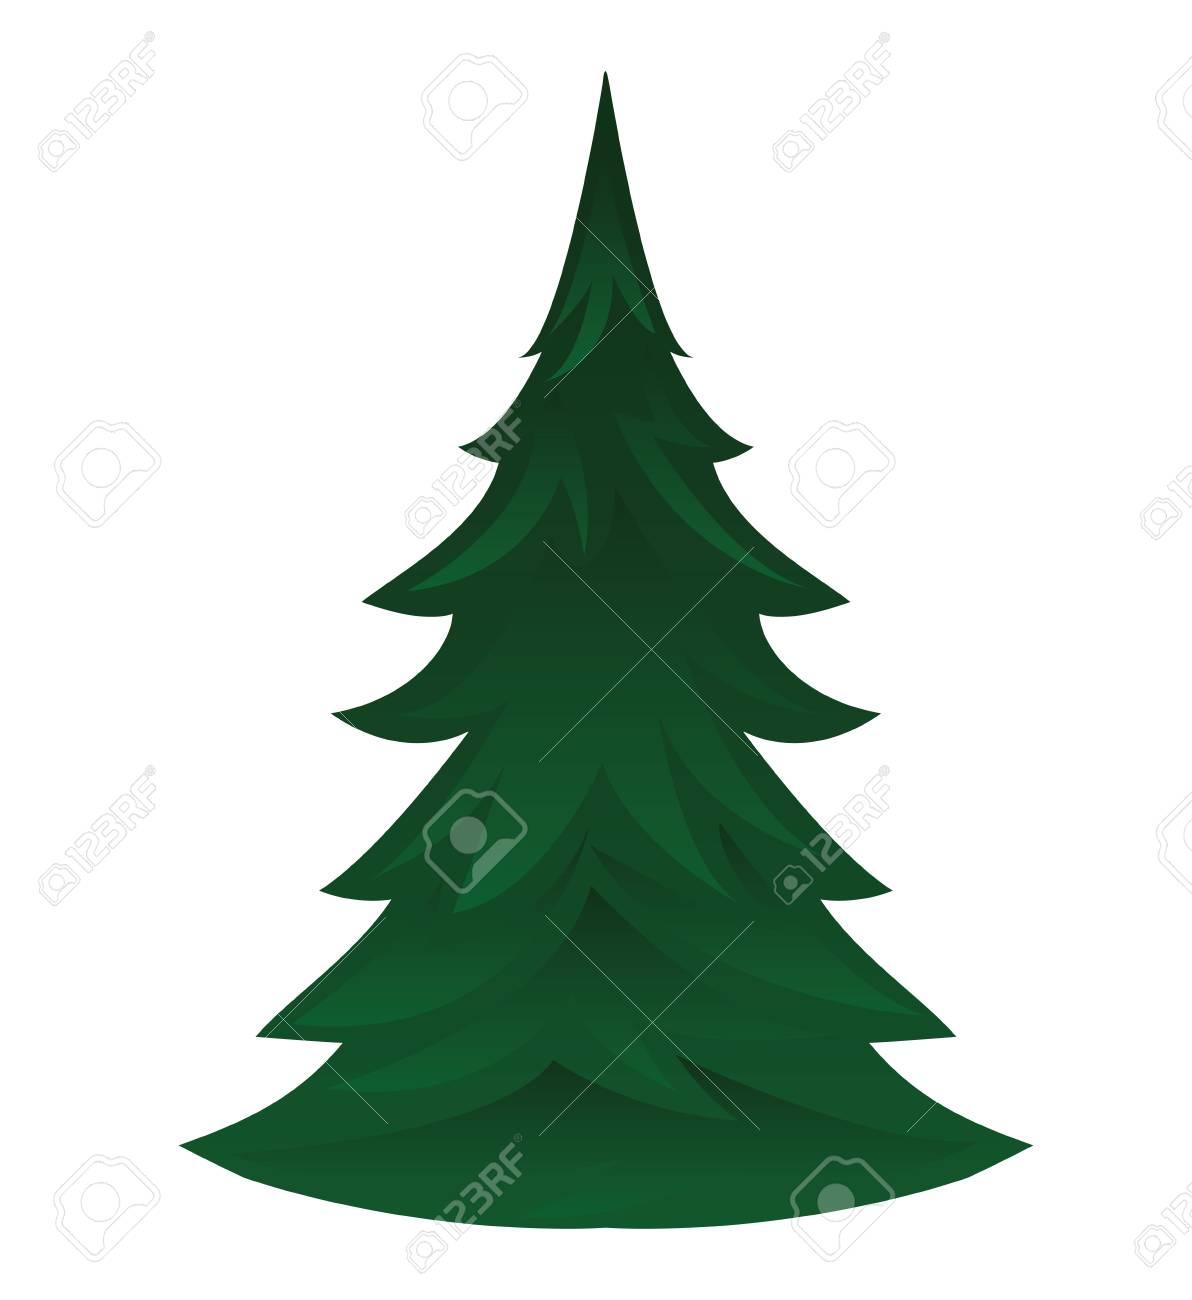 pine tree isolated icon vector illustration design - 61324691